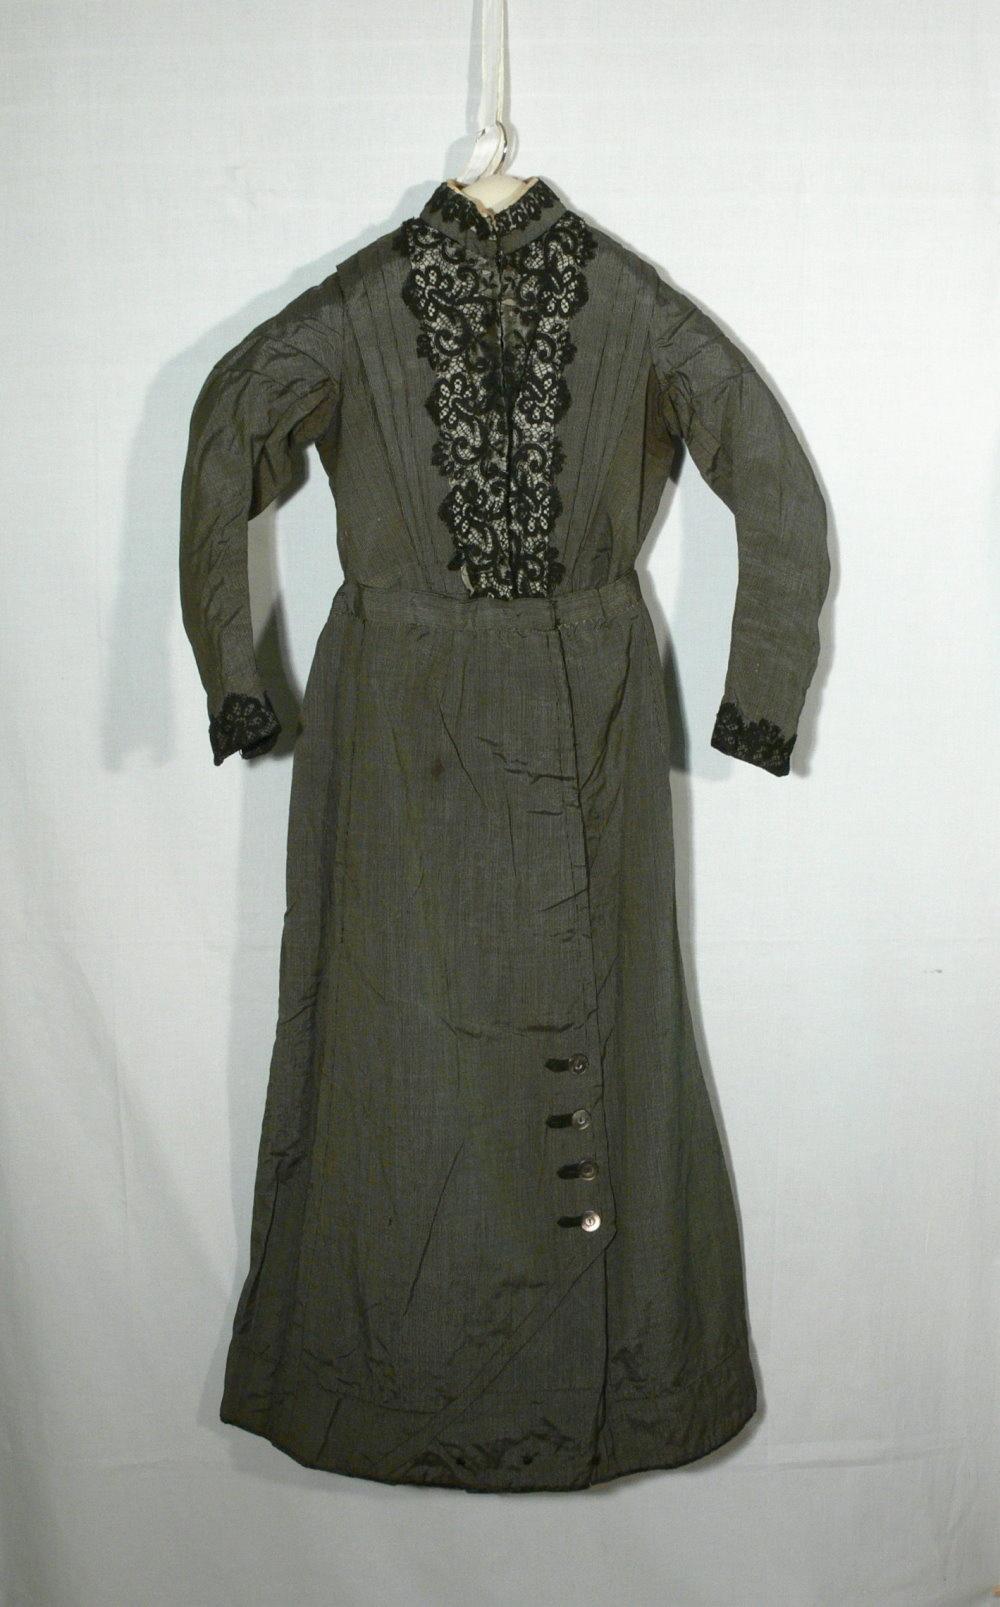 Museum DamenkleidPrignitz Havelberg Am Zweiteiliges Dom J5cTFK13ul